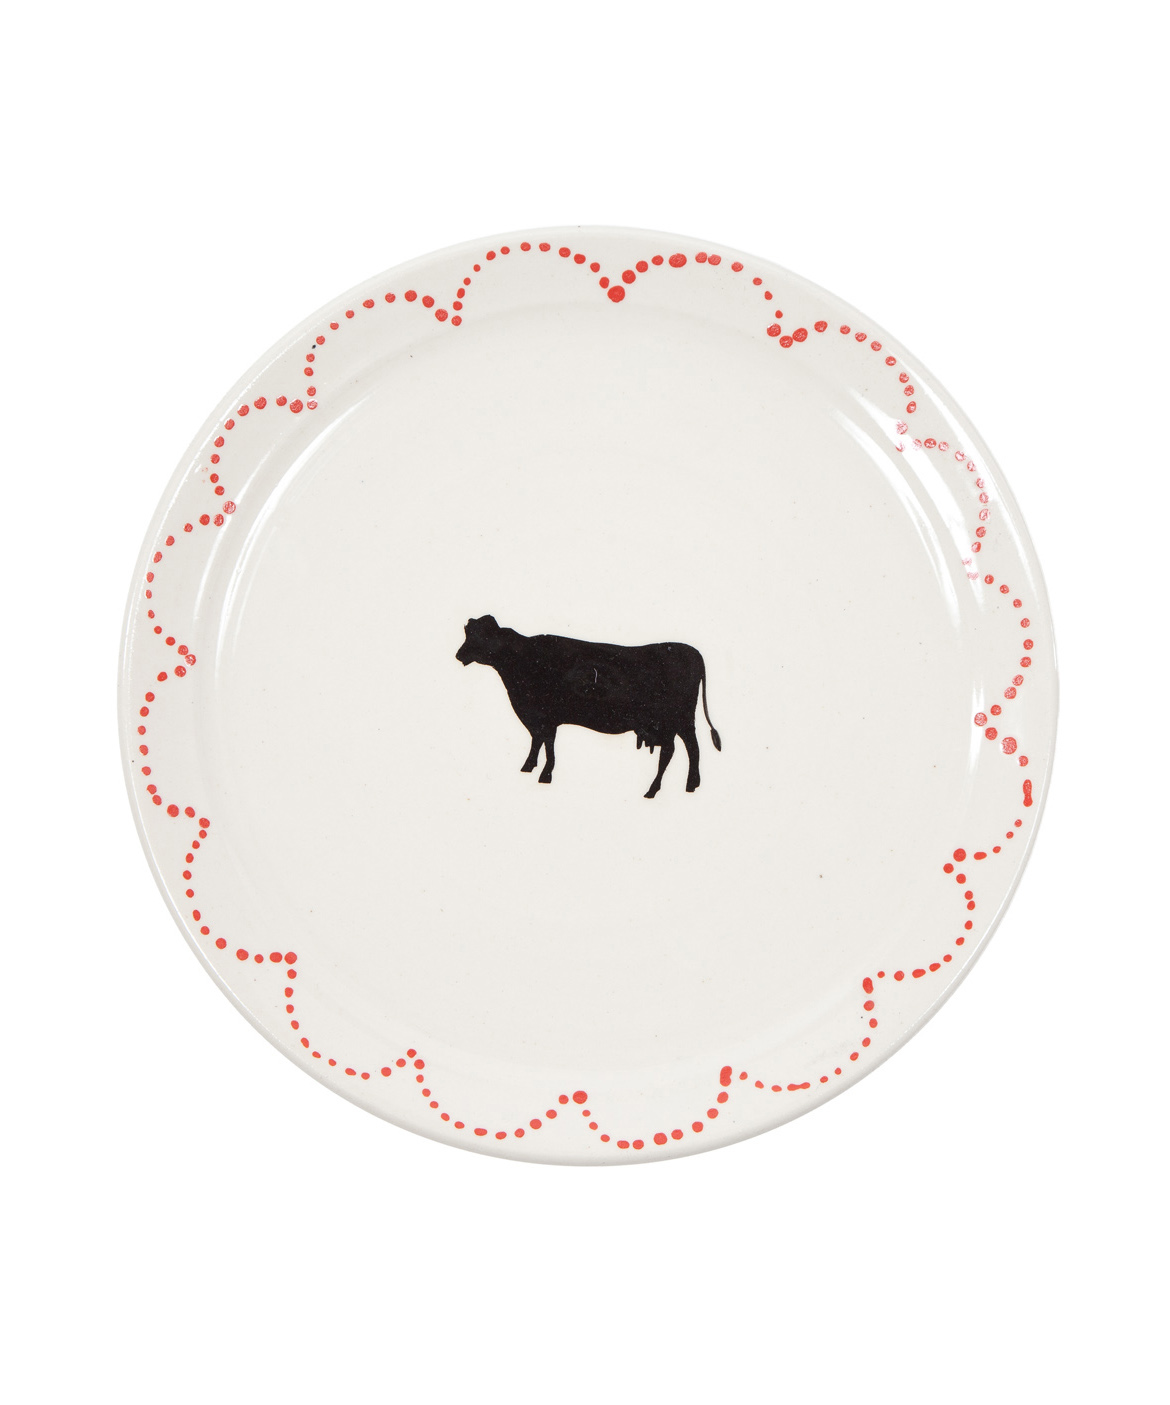 Cow Dinner Plate